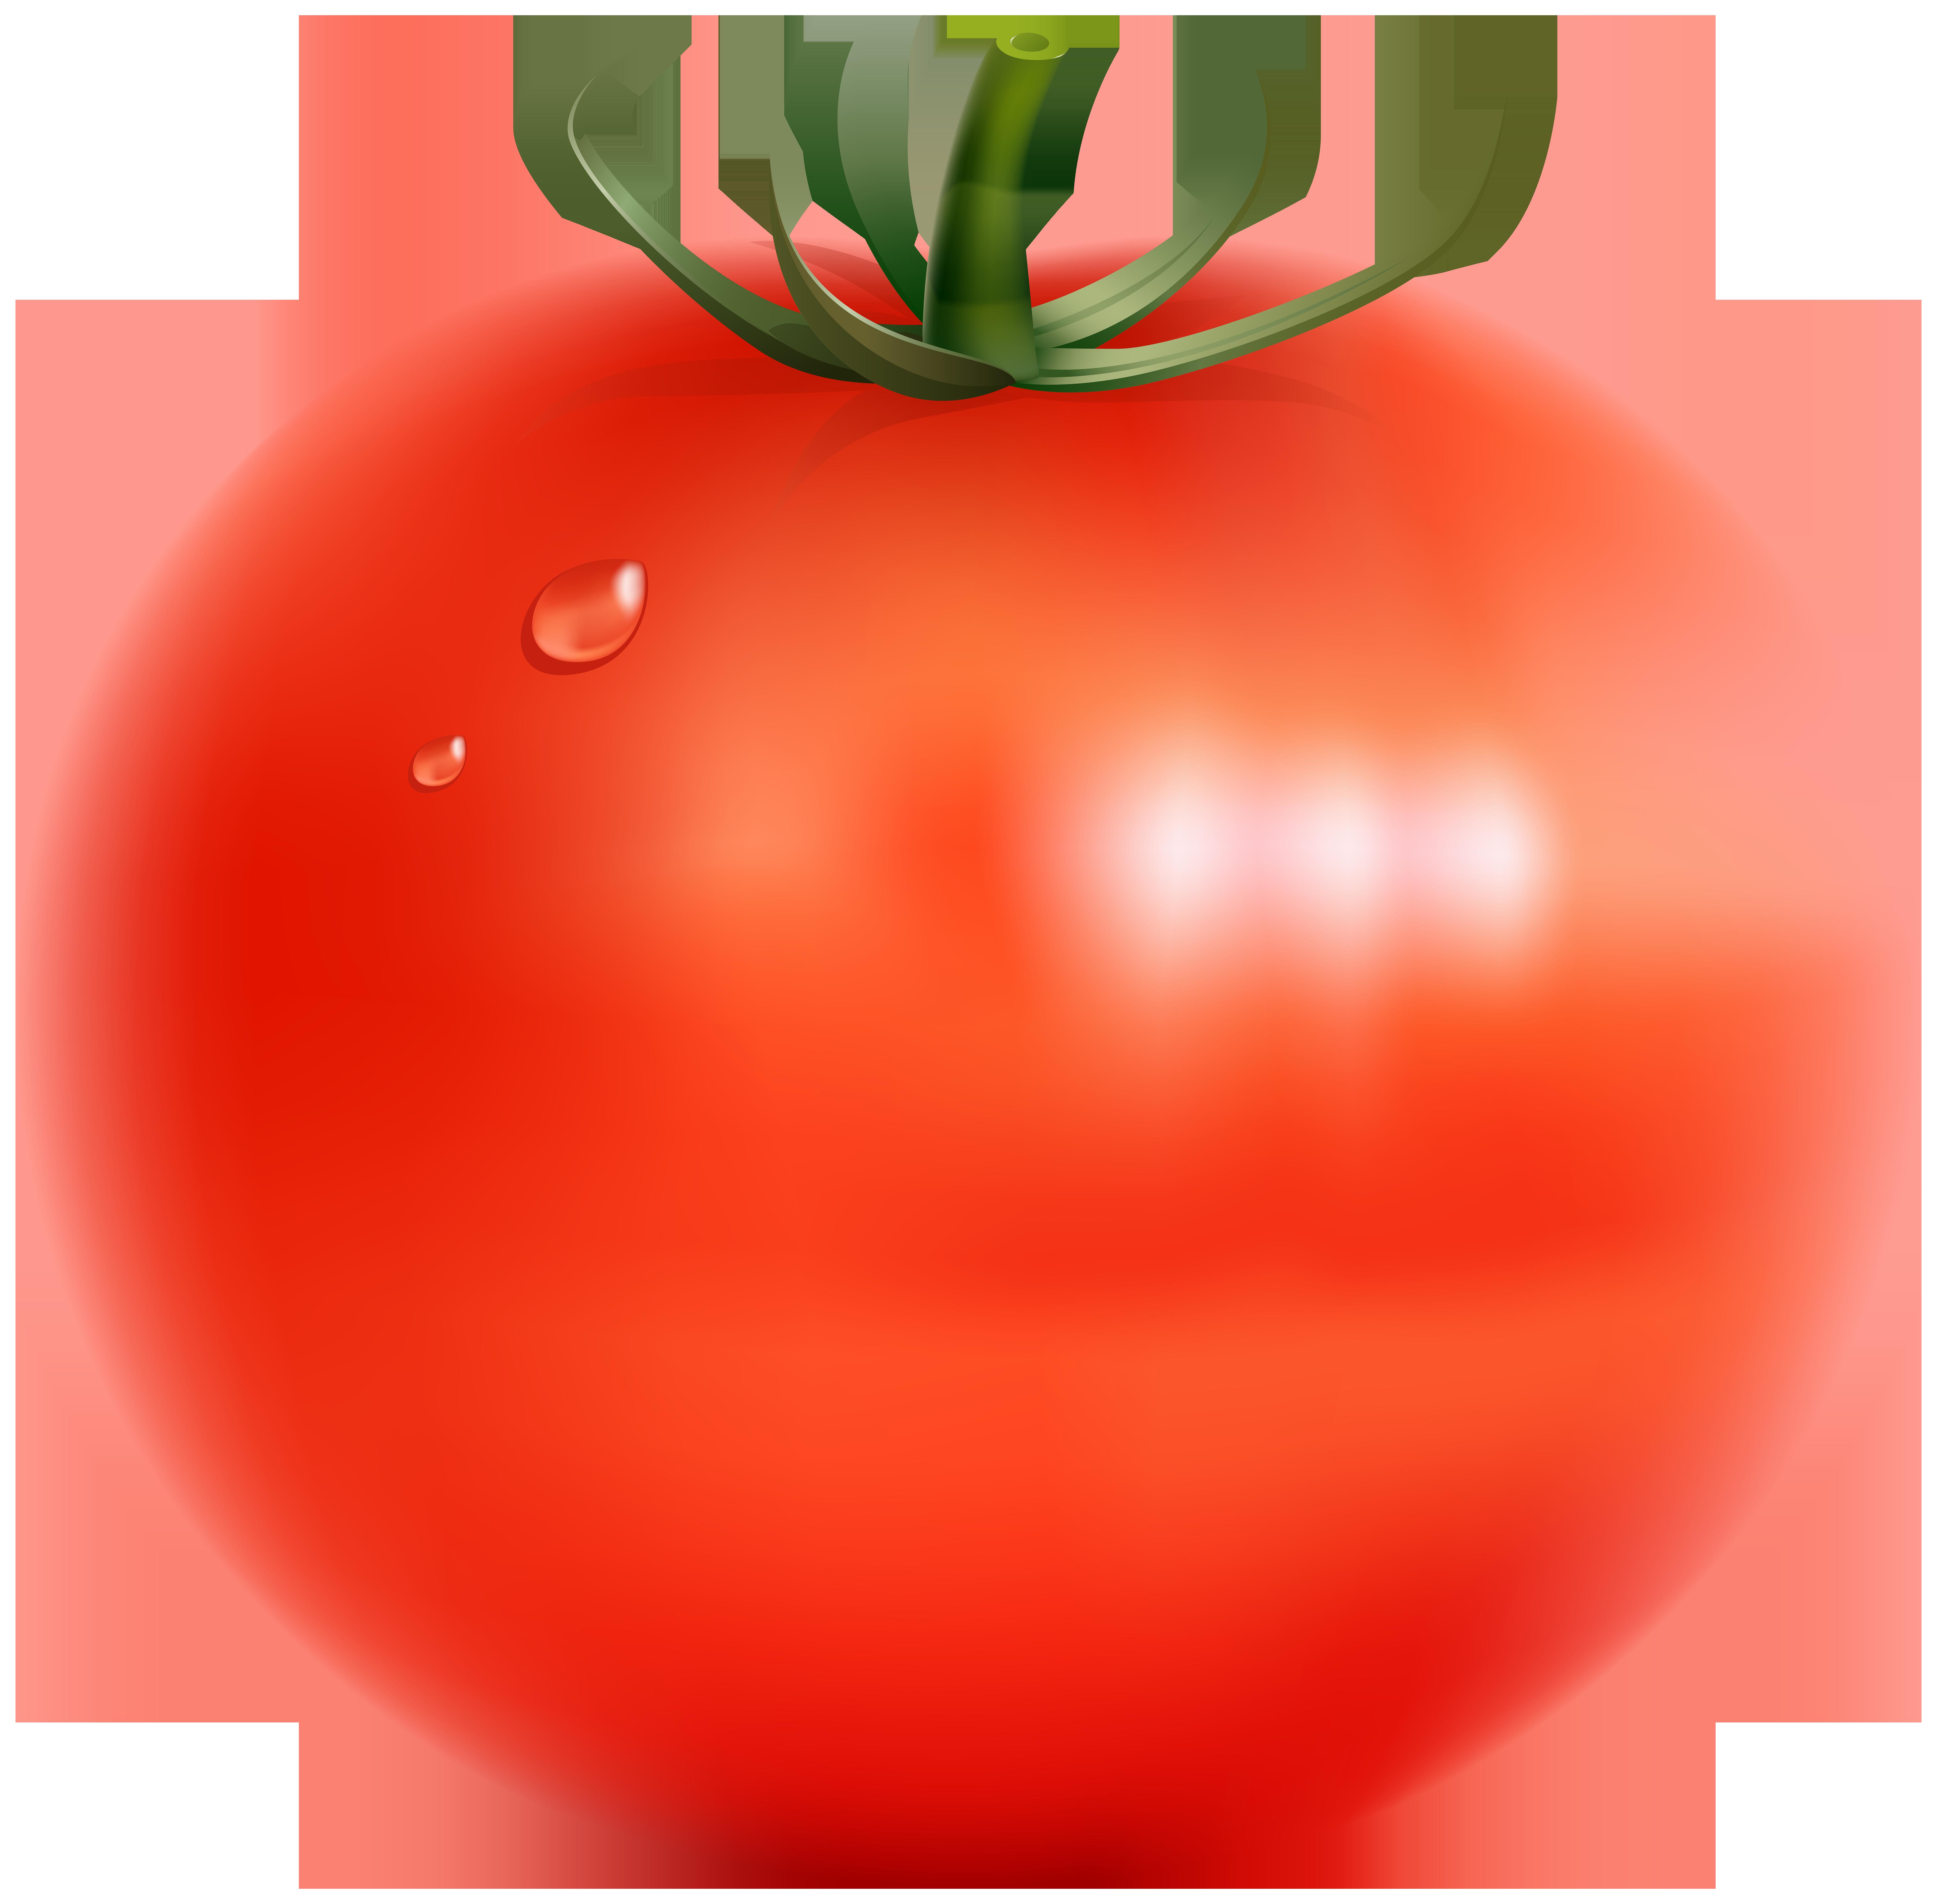 vegetables clipart transparent 20 free Cliparts | Download ...